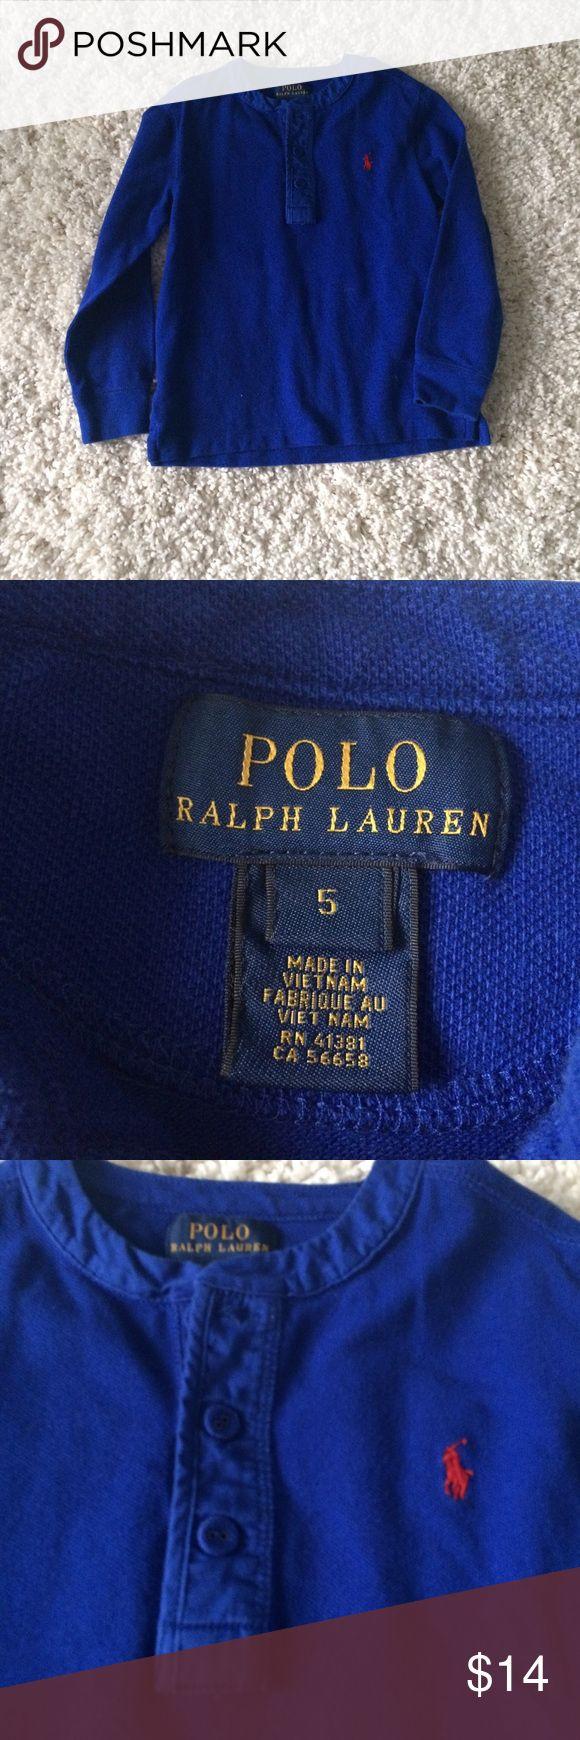 POLO Ralph Lauren [boys] blue Henley Top Worn once. Blue Henley type Top. Polo by Ralph Lauren Shirts & Tops